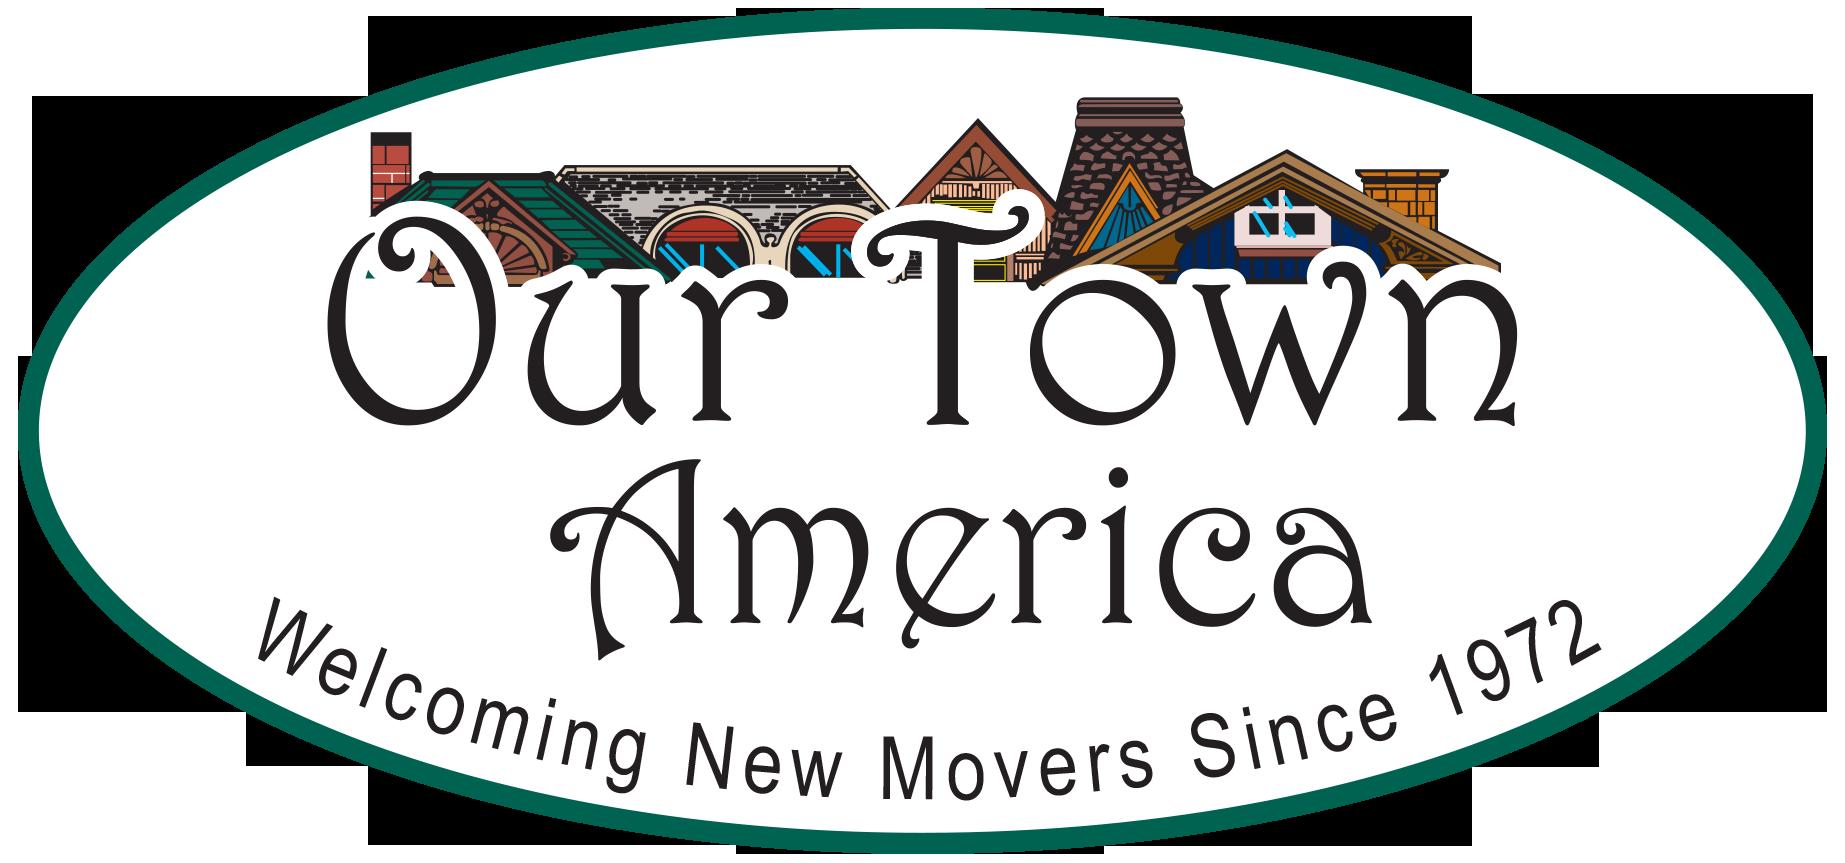 Neighborhood clipart our town. America osprey nokomis florida